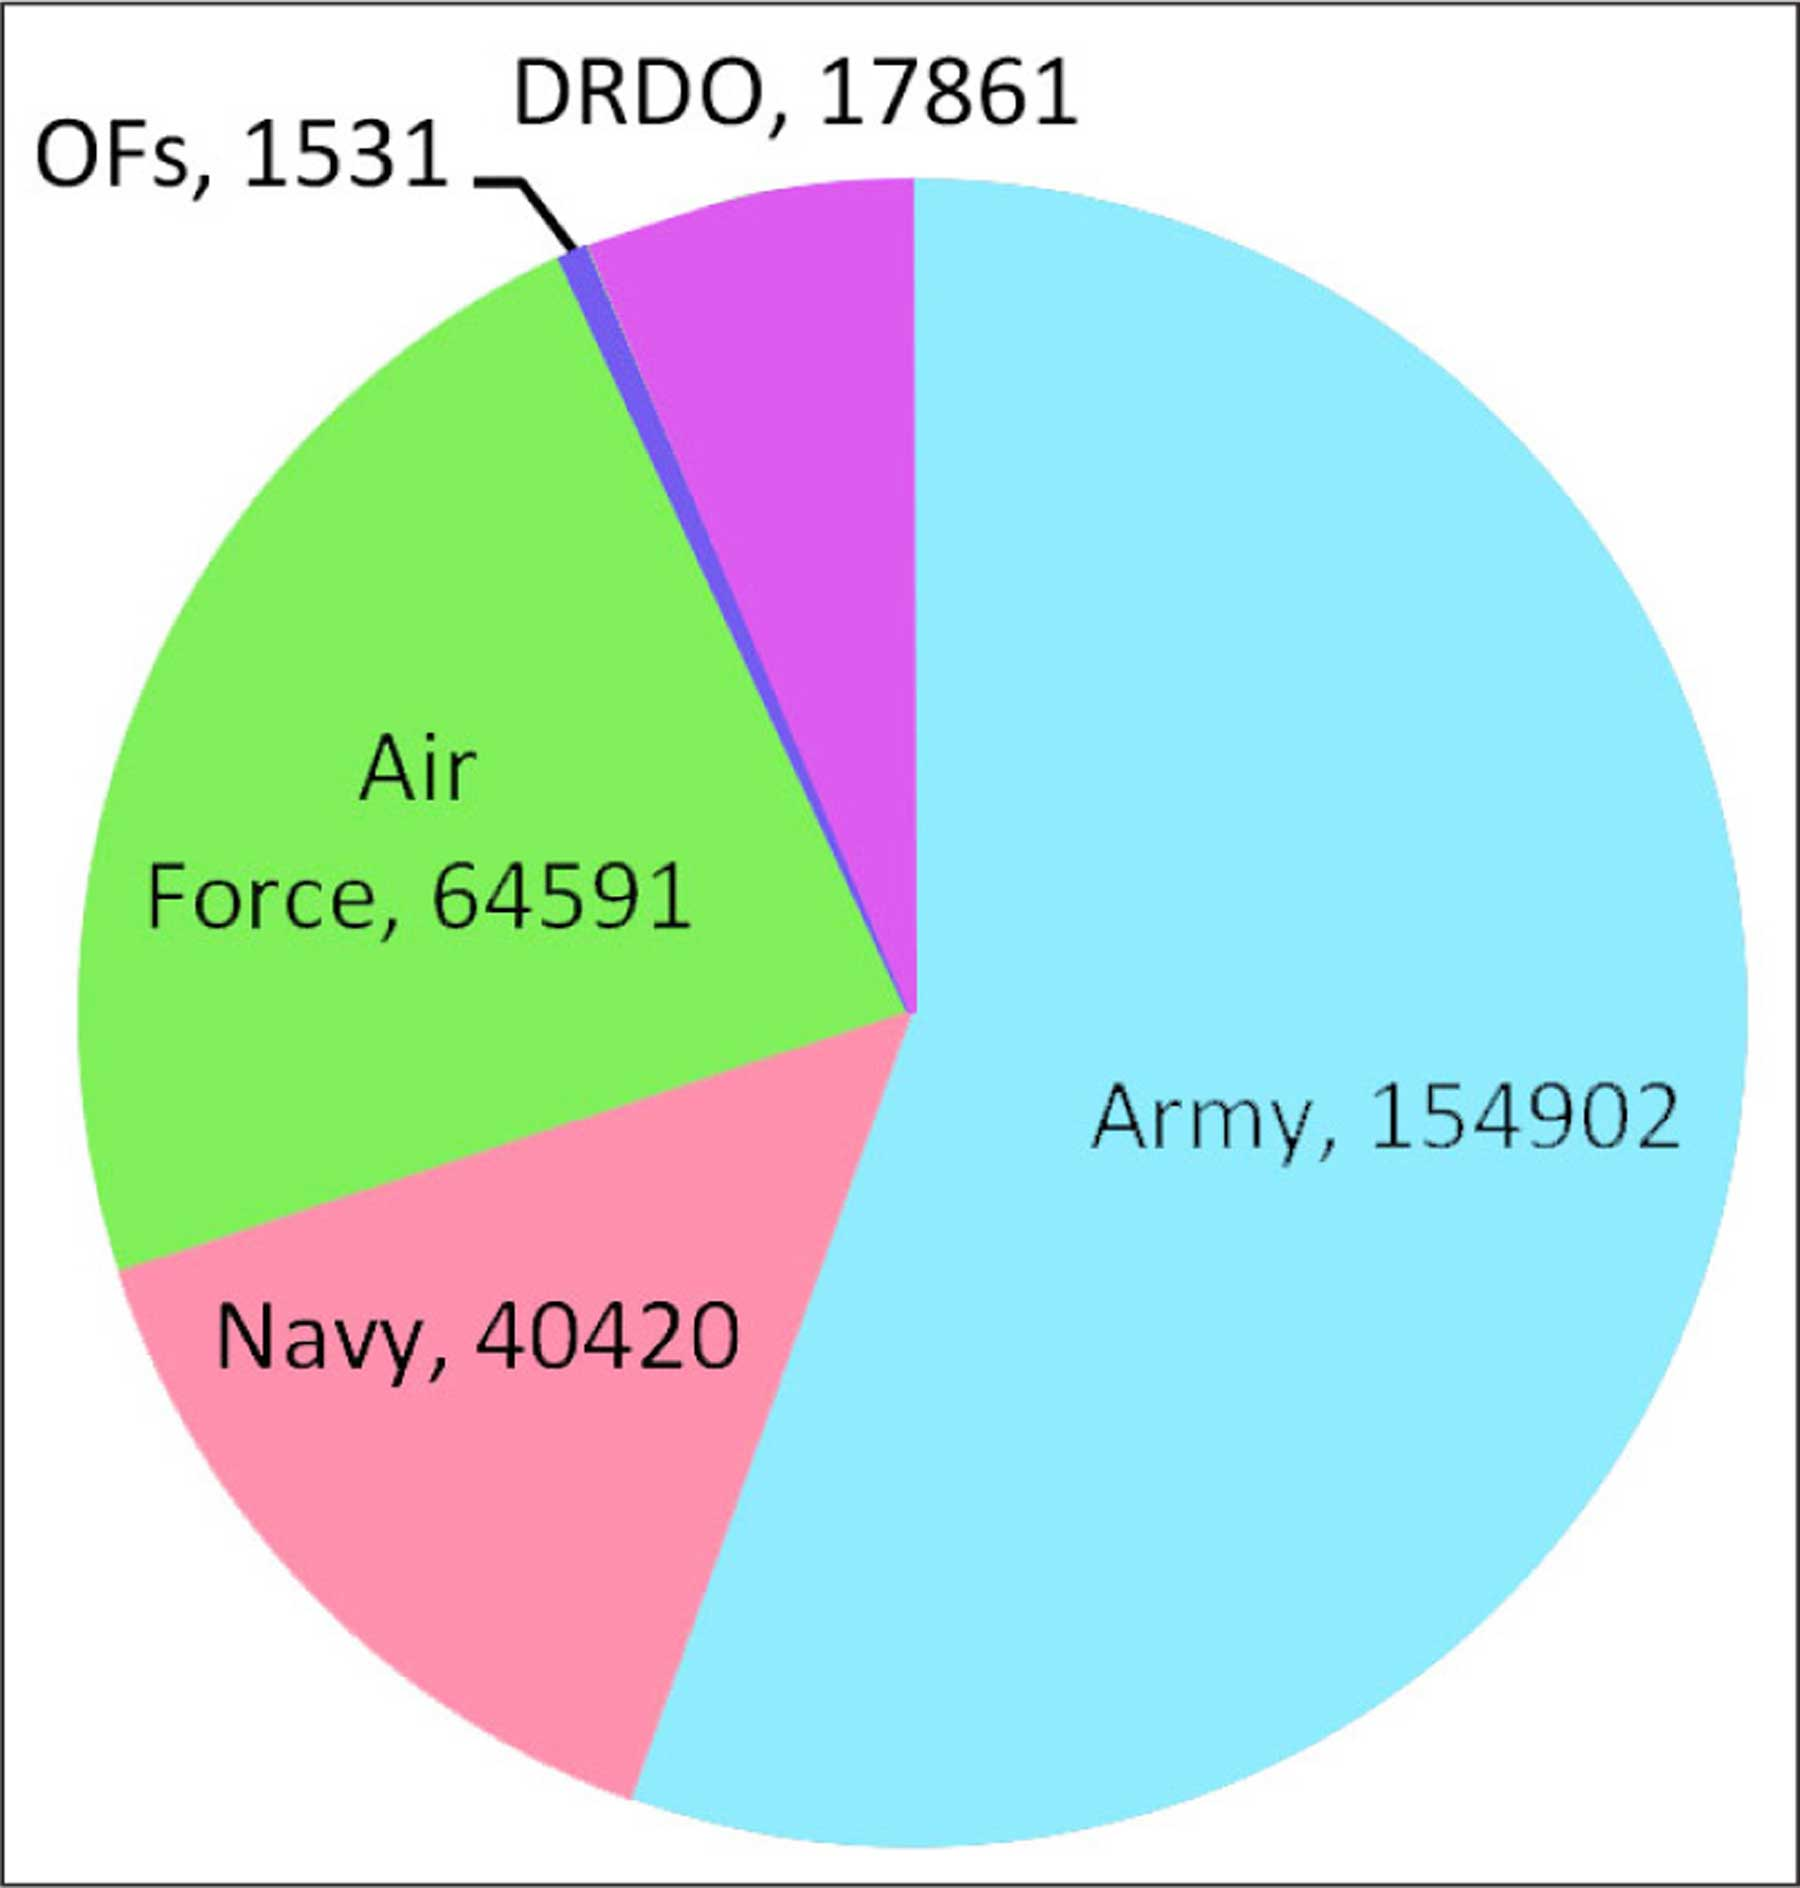 Defence Budget 2018-19